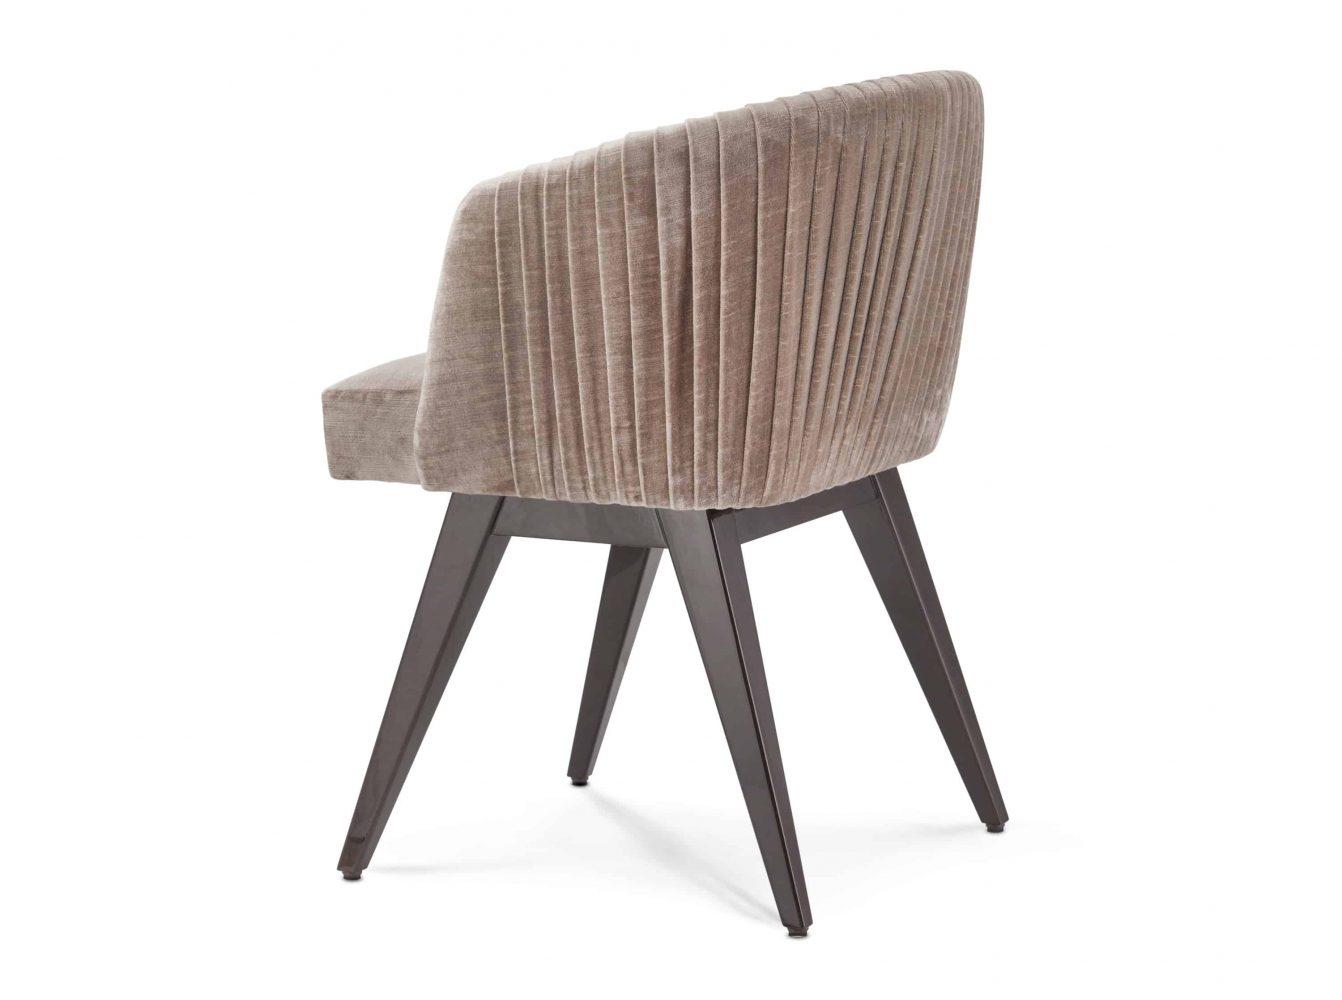 Eleanor-G701918-Chair-S-03